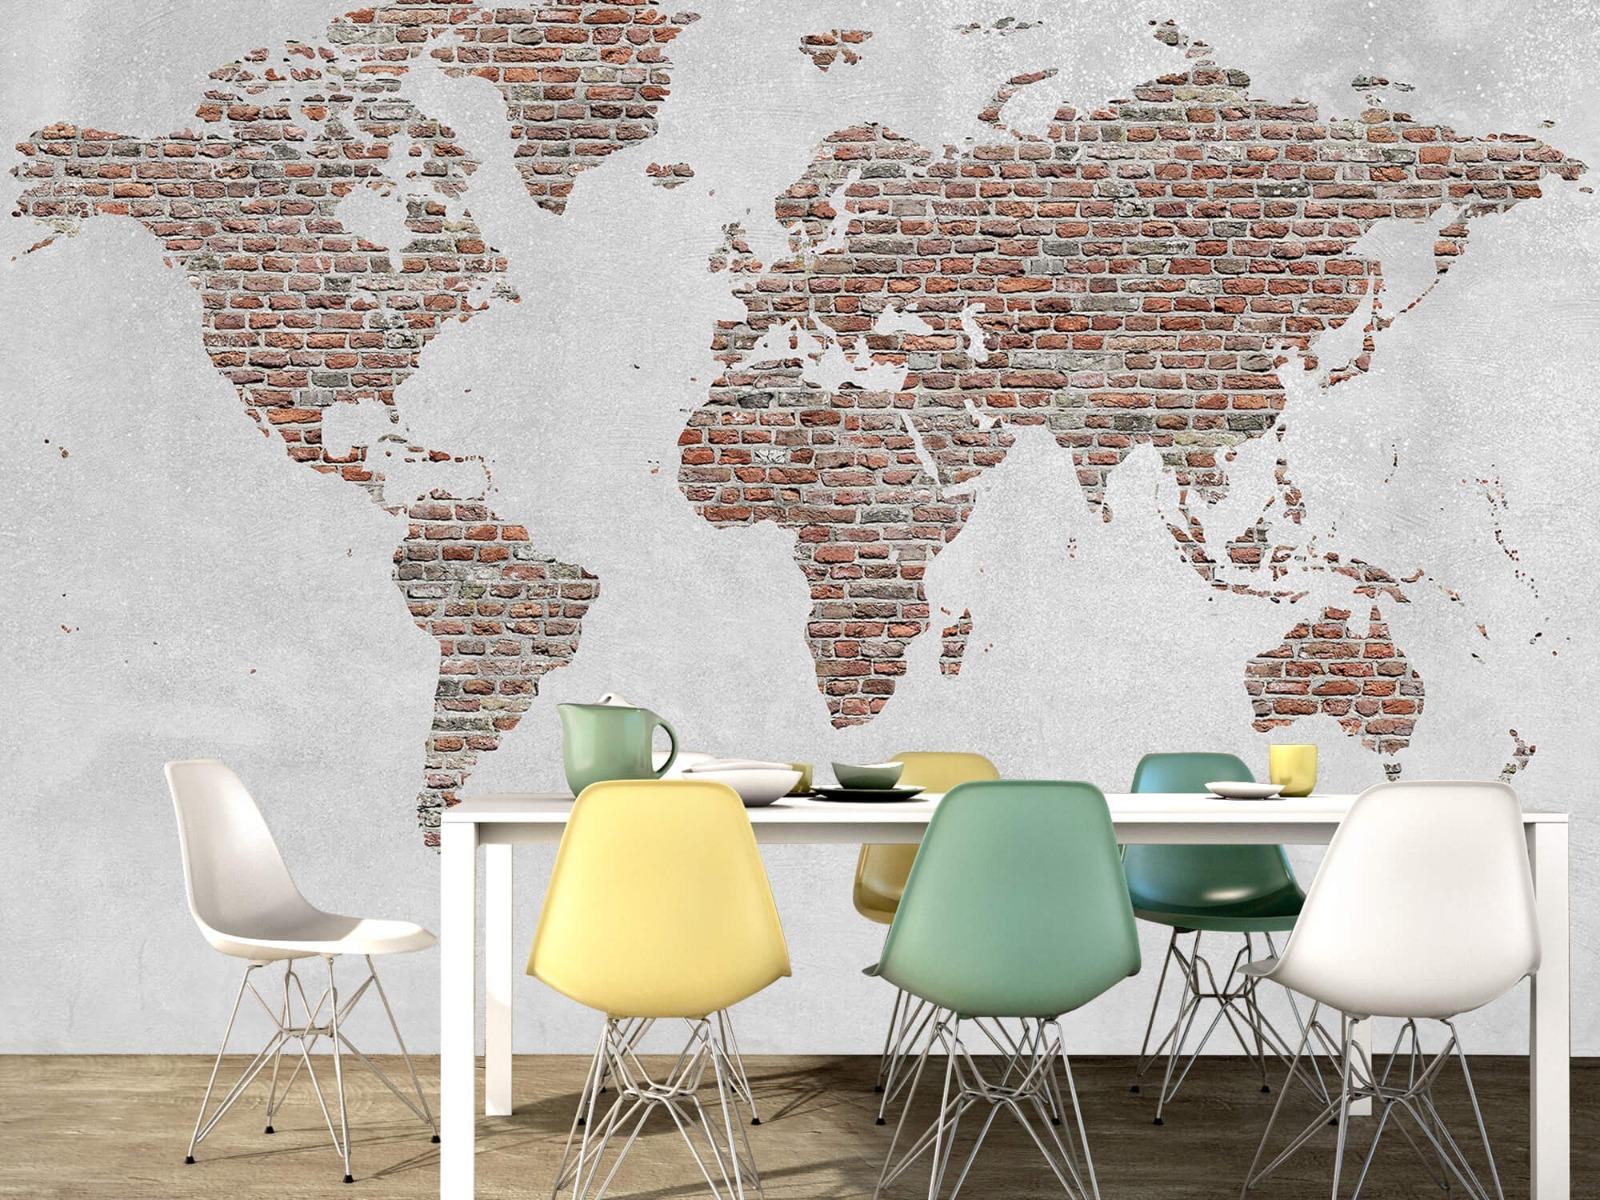 Steen behang - Wereldkaart stenen - Slaapkamer 15